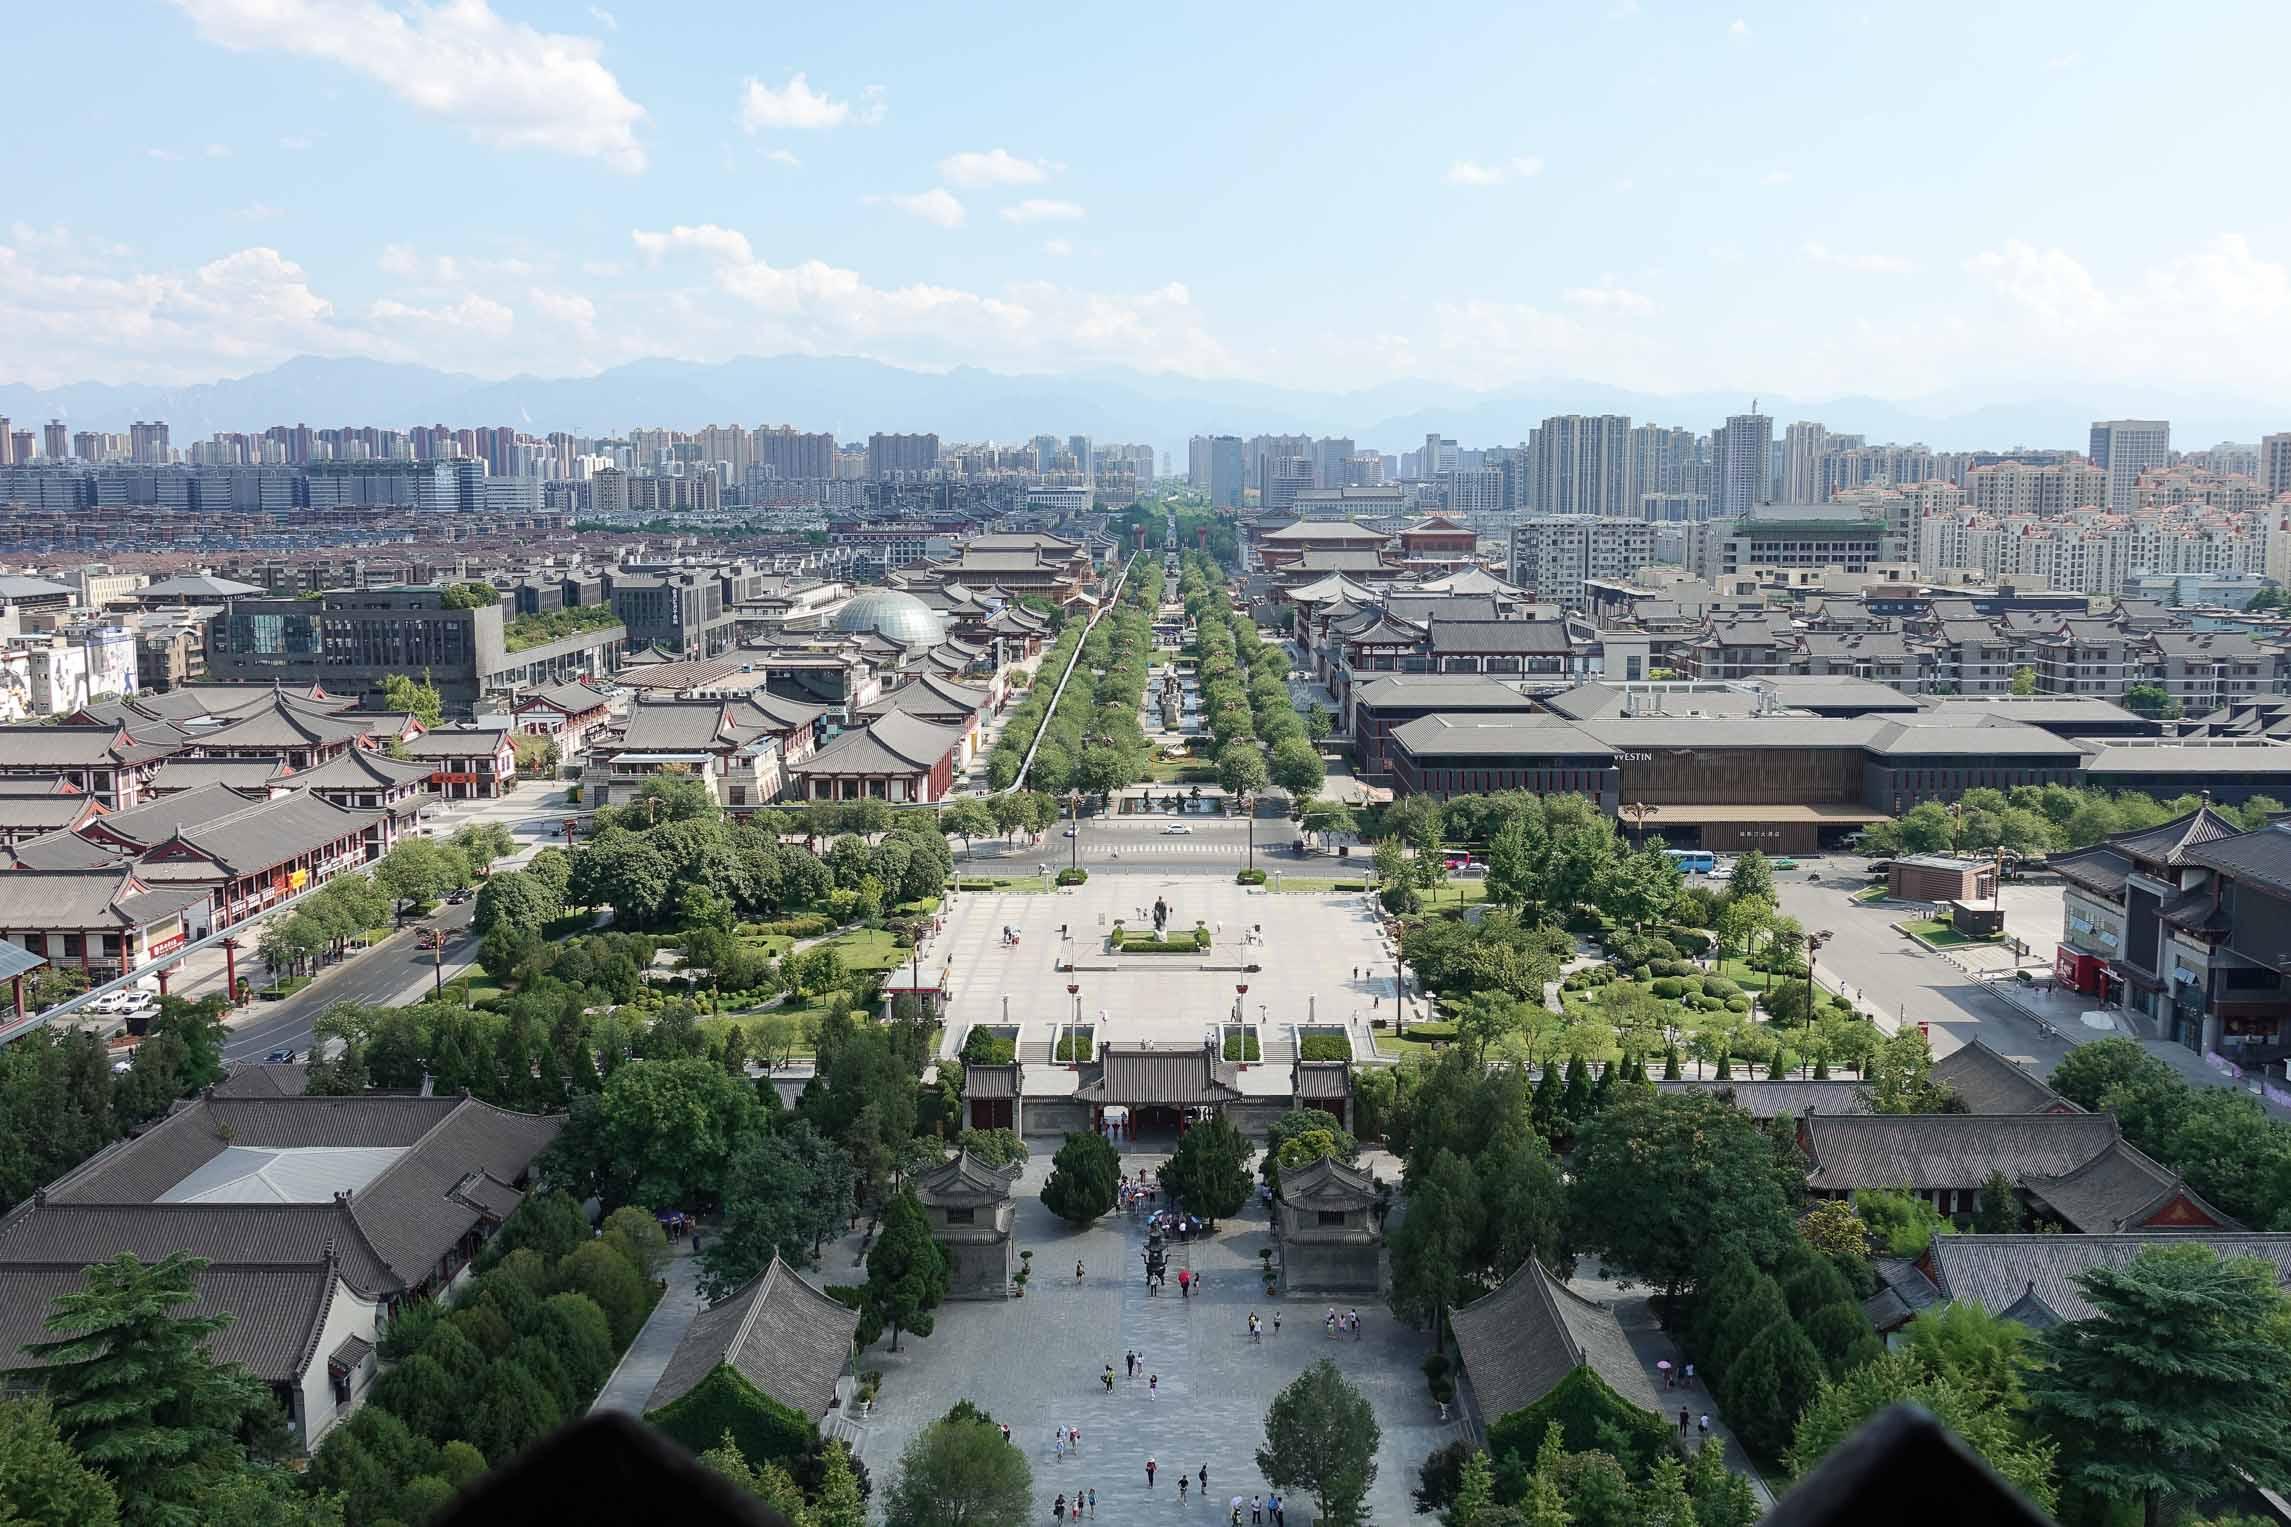 South Xi'an